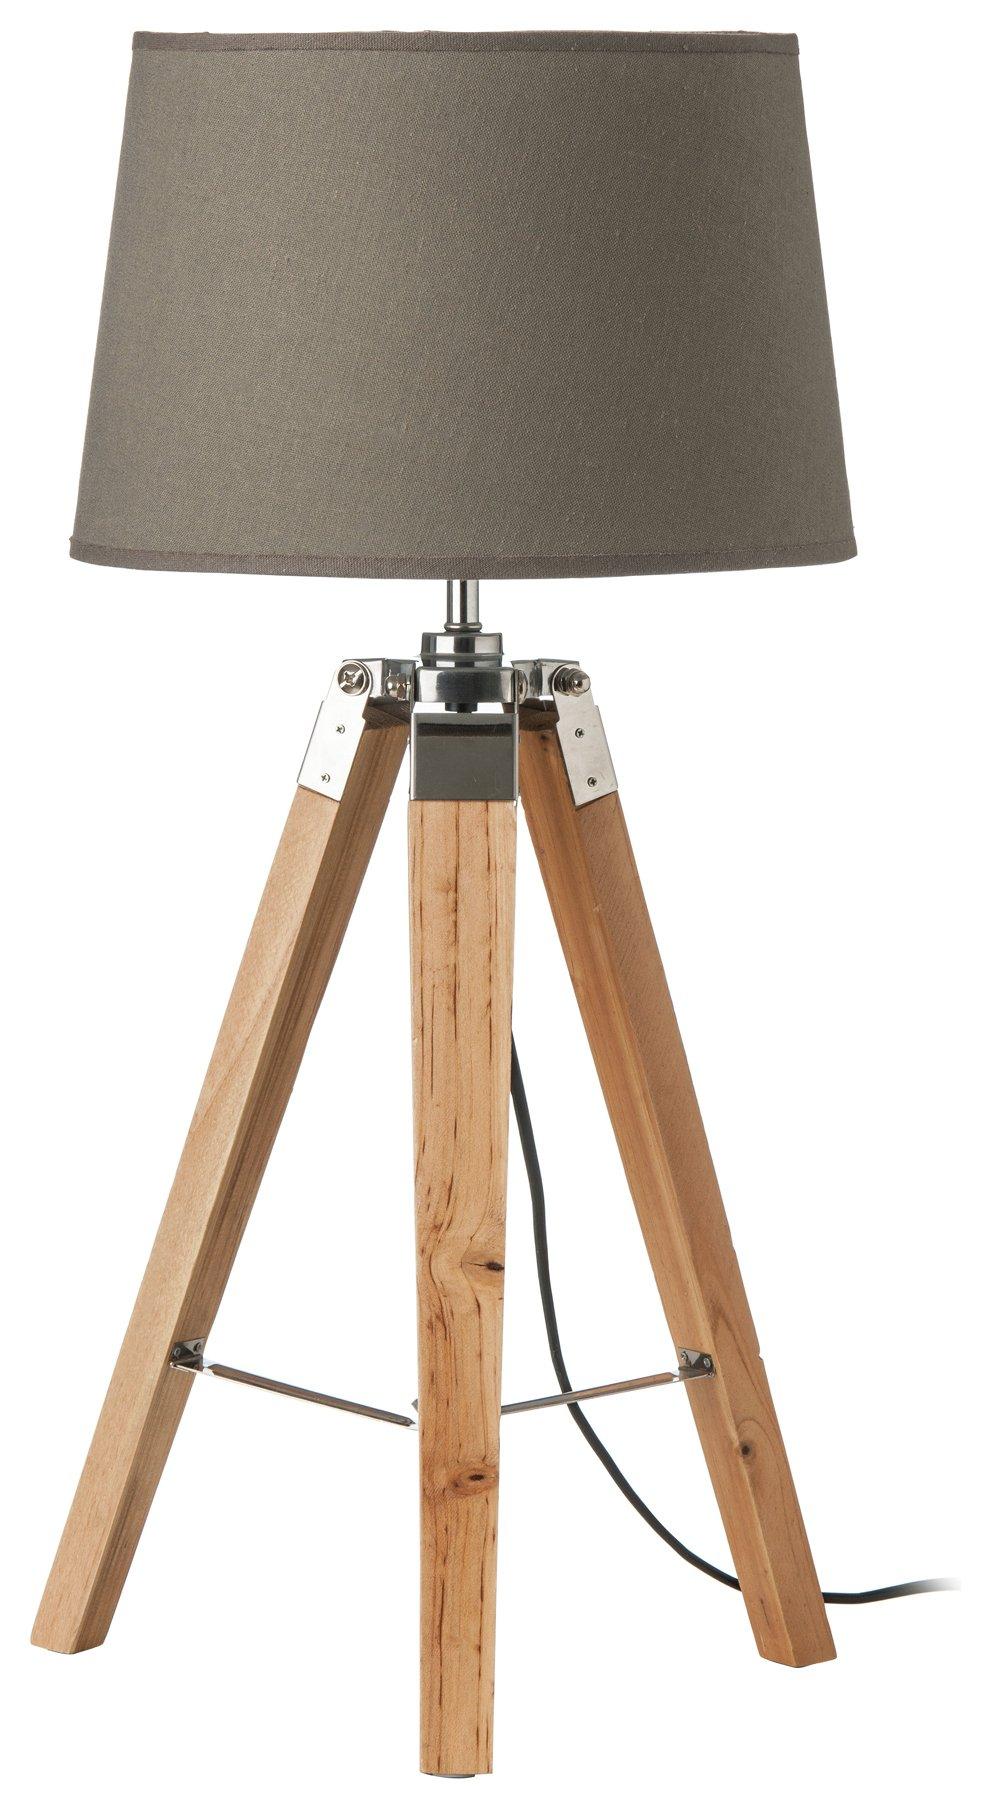 Wood Base Tripod Table Lamp - Grey